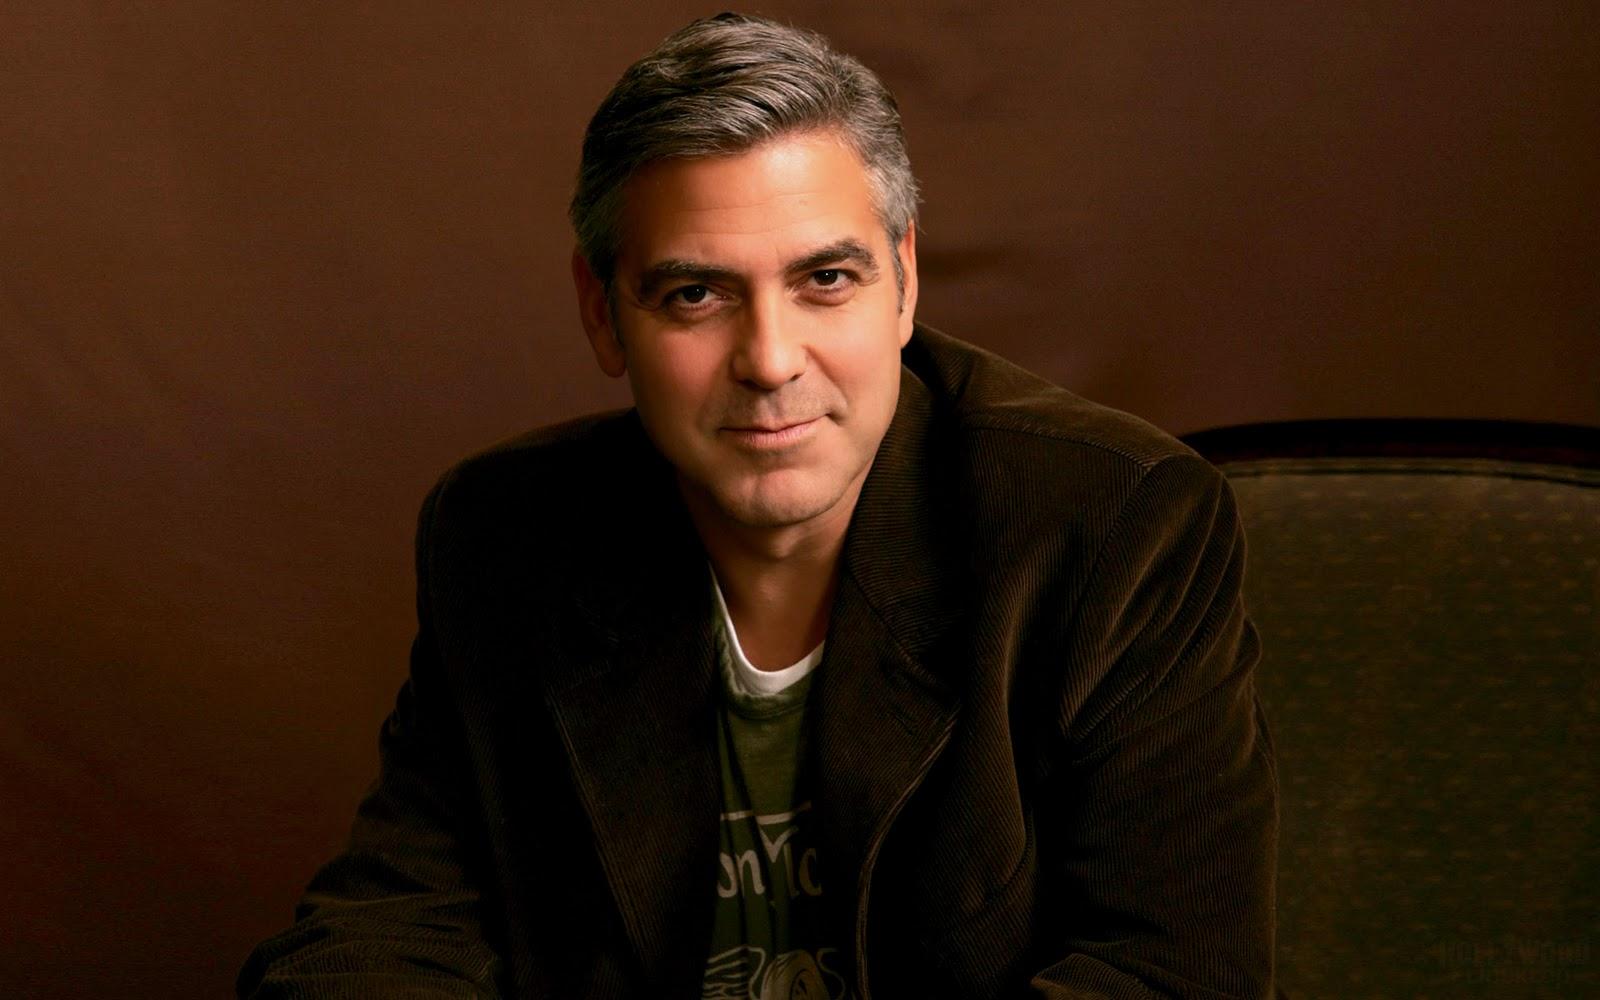 http://3.bp.blogspot.com/-o9N9Y0NKW9U/TwHceqKbU2I/AAAAAAAADFc/SNlO4ZtV8dU/s1600/George-Clooney-0-hwoodworld.blogspot.com.jpg